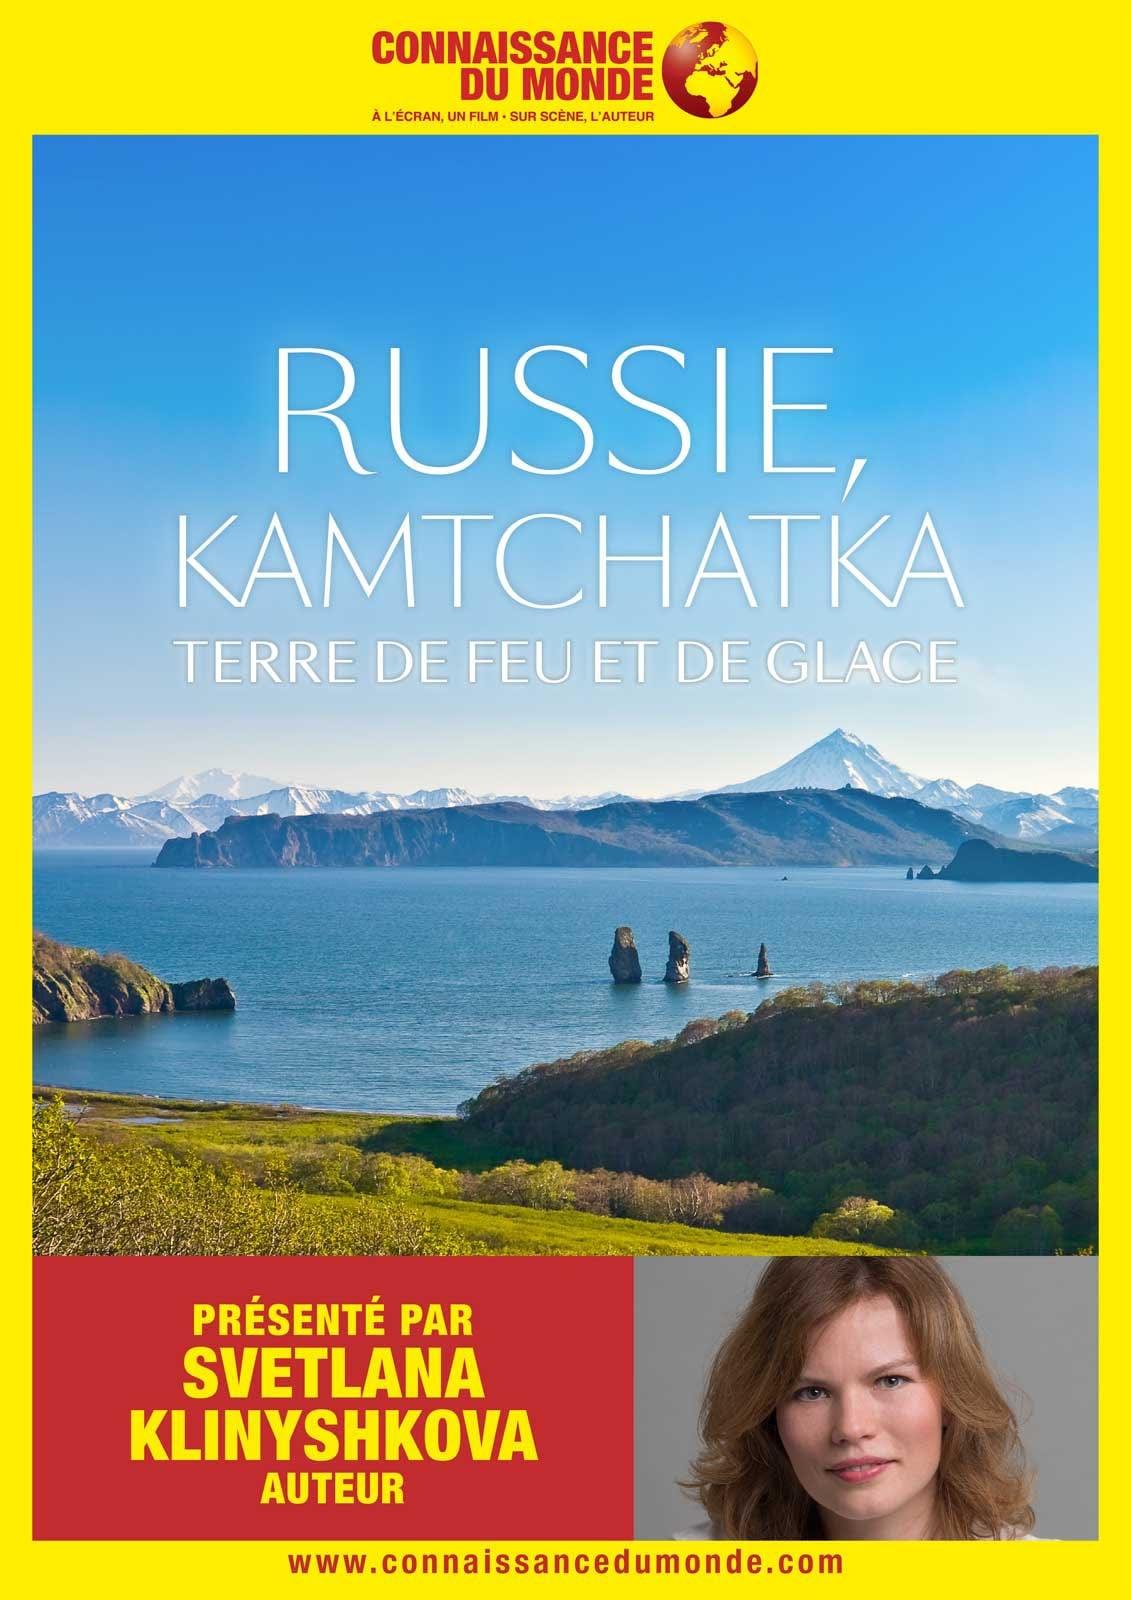 RUSSIE, KAMTCHATKA, Terre de feu et de glace (2018)